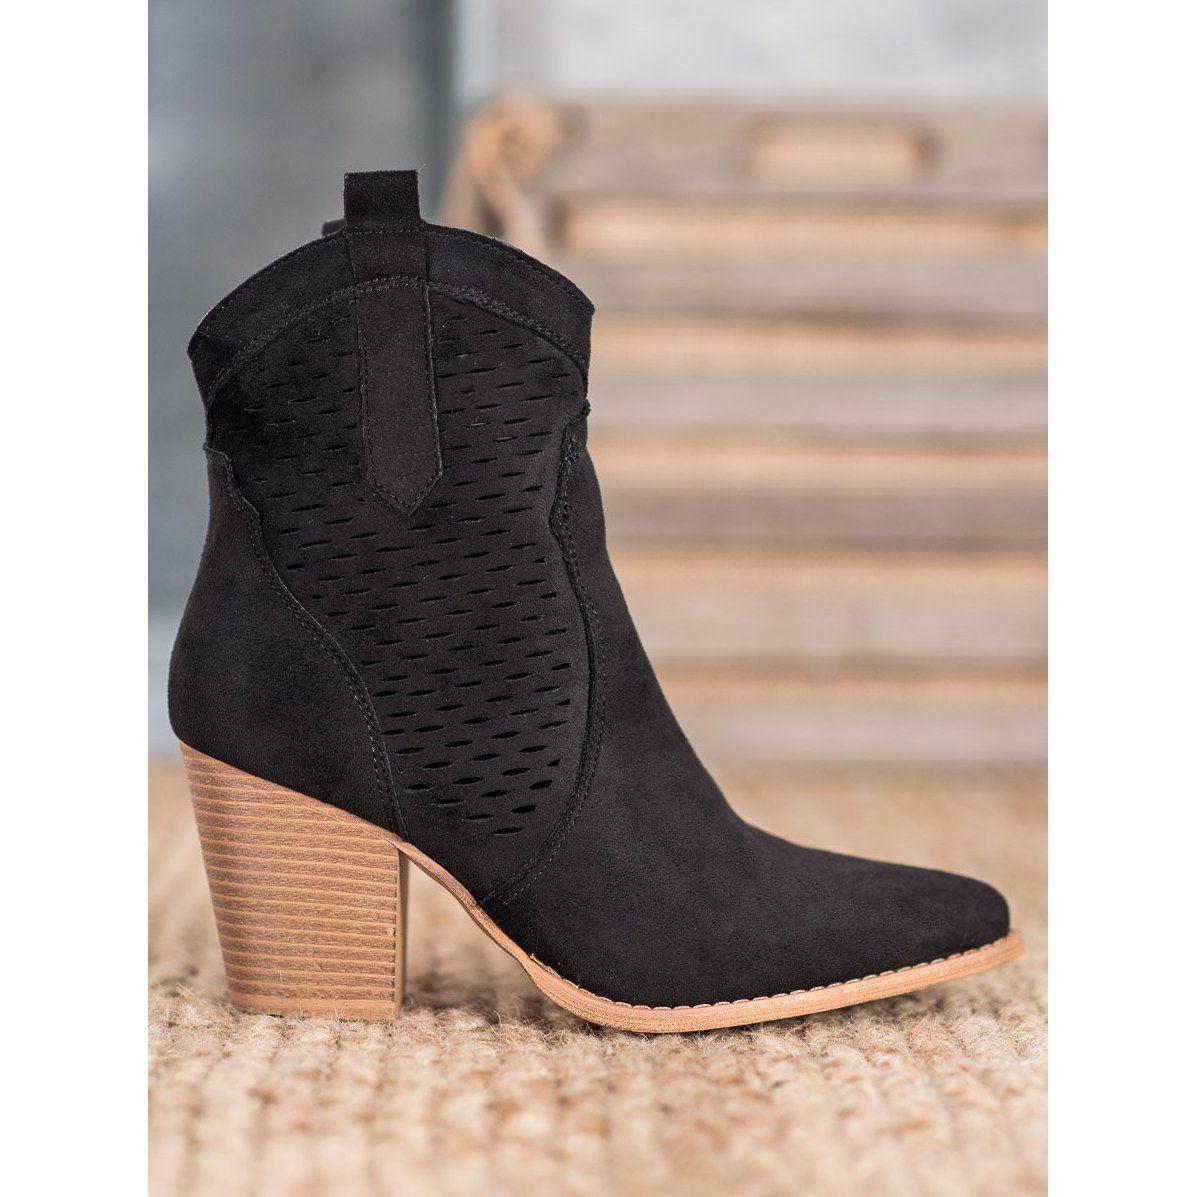 Seastar Azurowe Kowbojki Na Slupku Czarne Boots Women Shoes Cowboy Boots